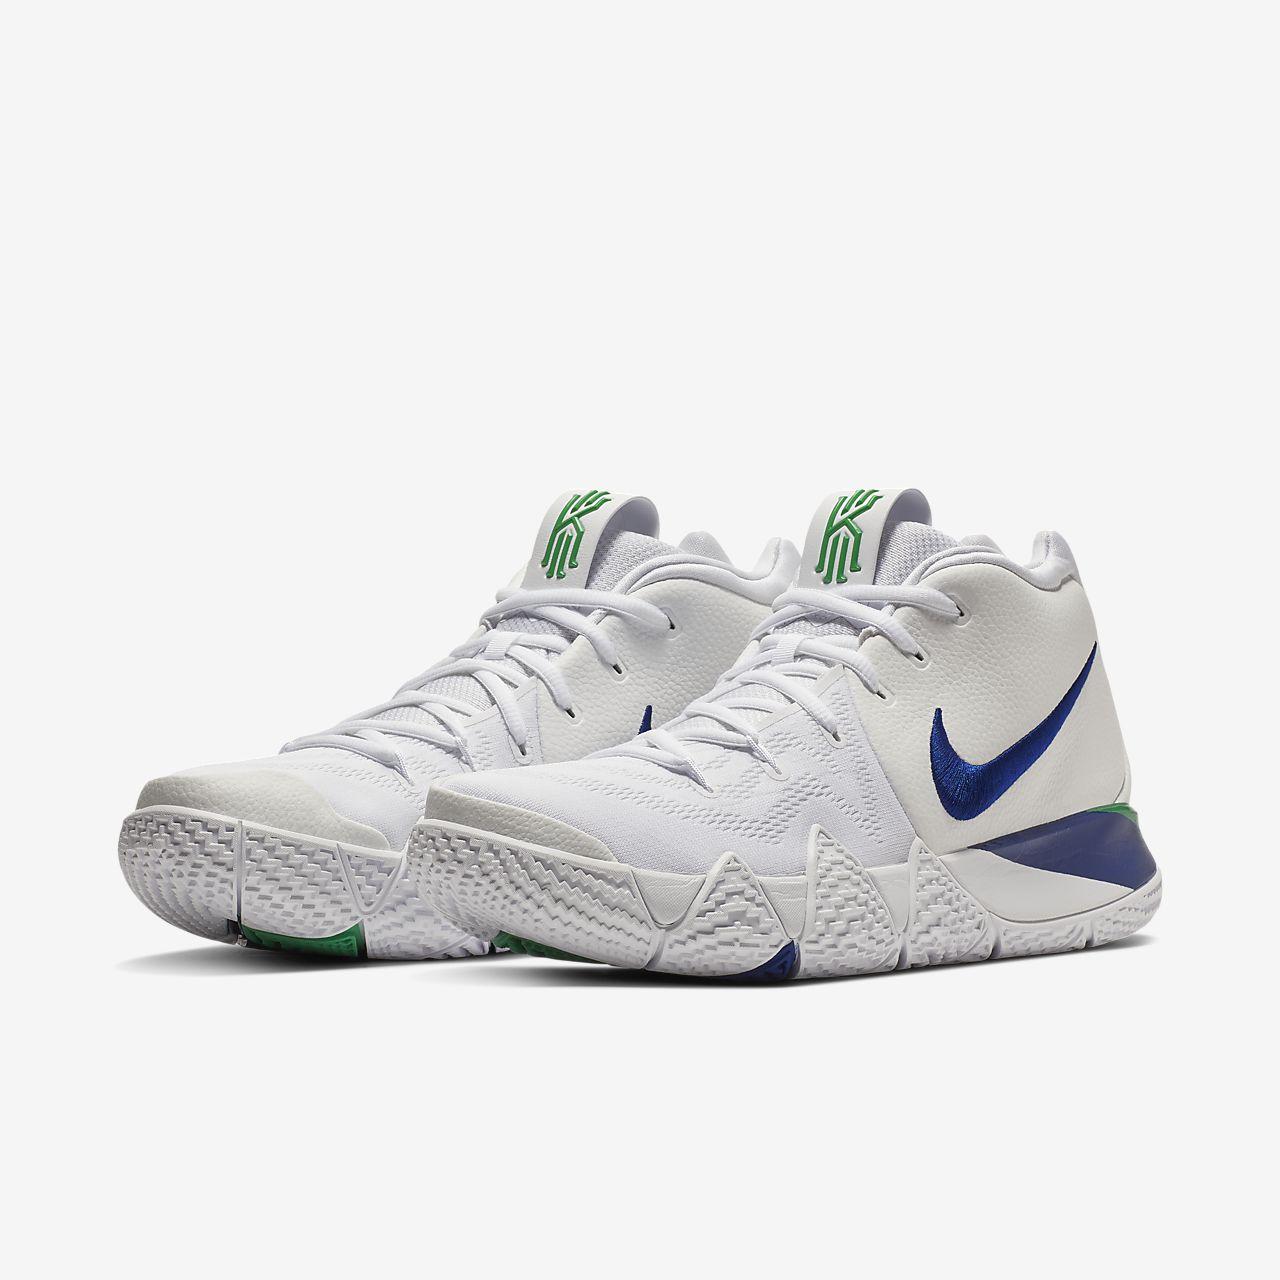 sports shoes 0c000 3ccf5 Nike Kyrie 4 Royal Blue Gold White Men s Basketball Shoes